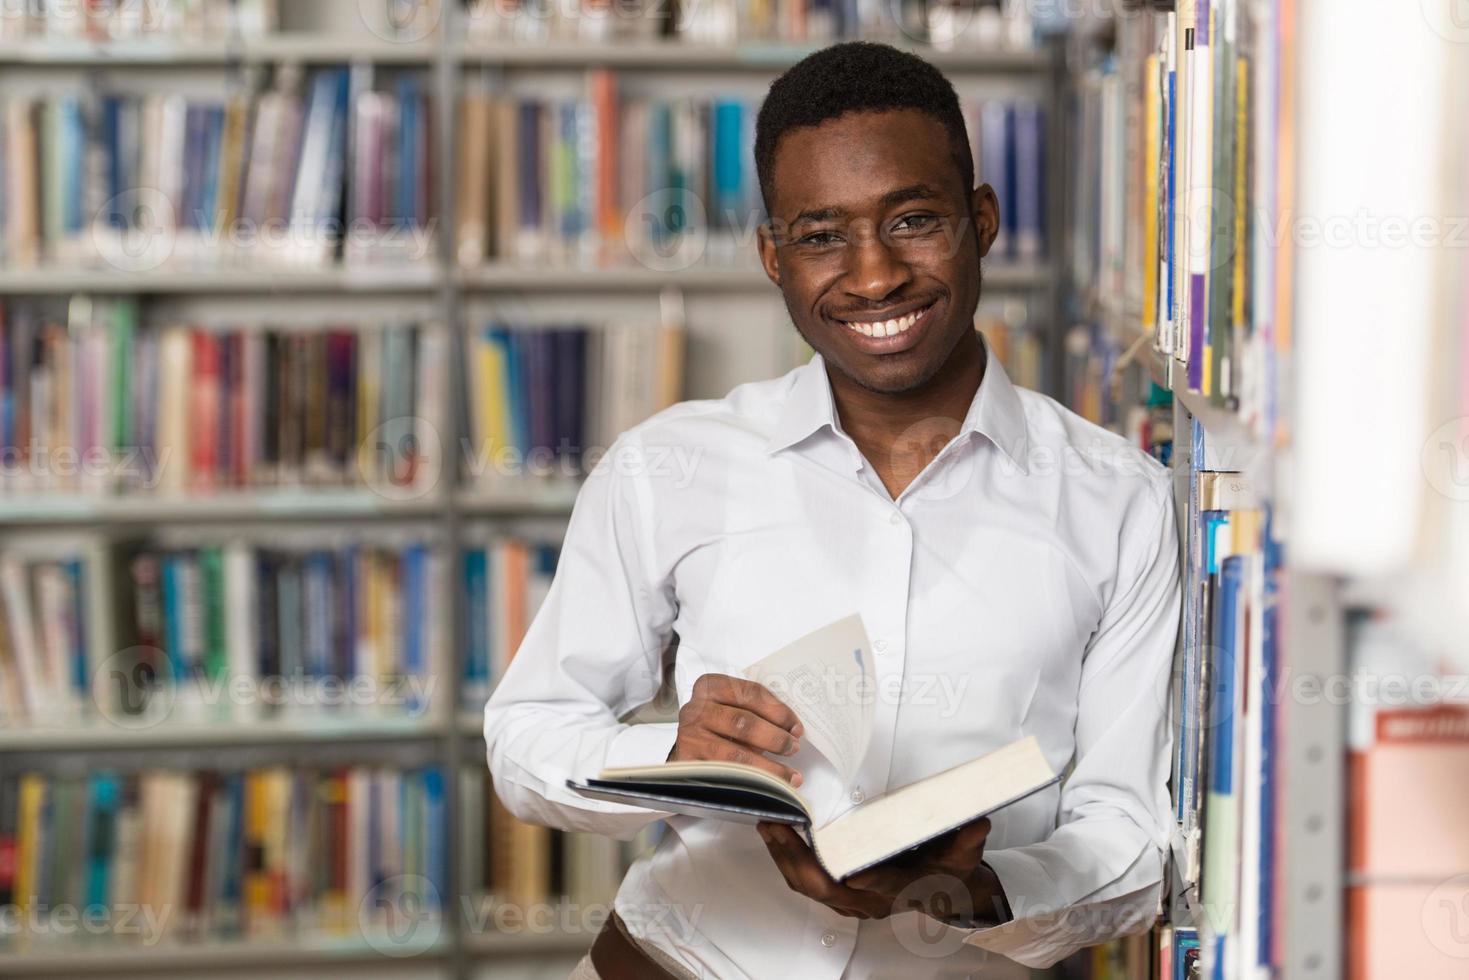 bel giovane studente universitario in una biblioteca foto